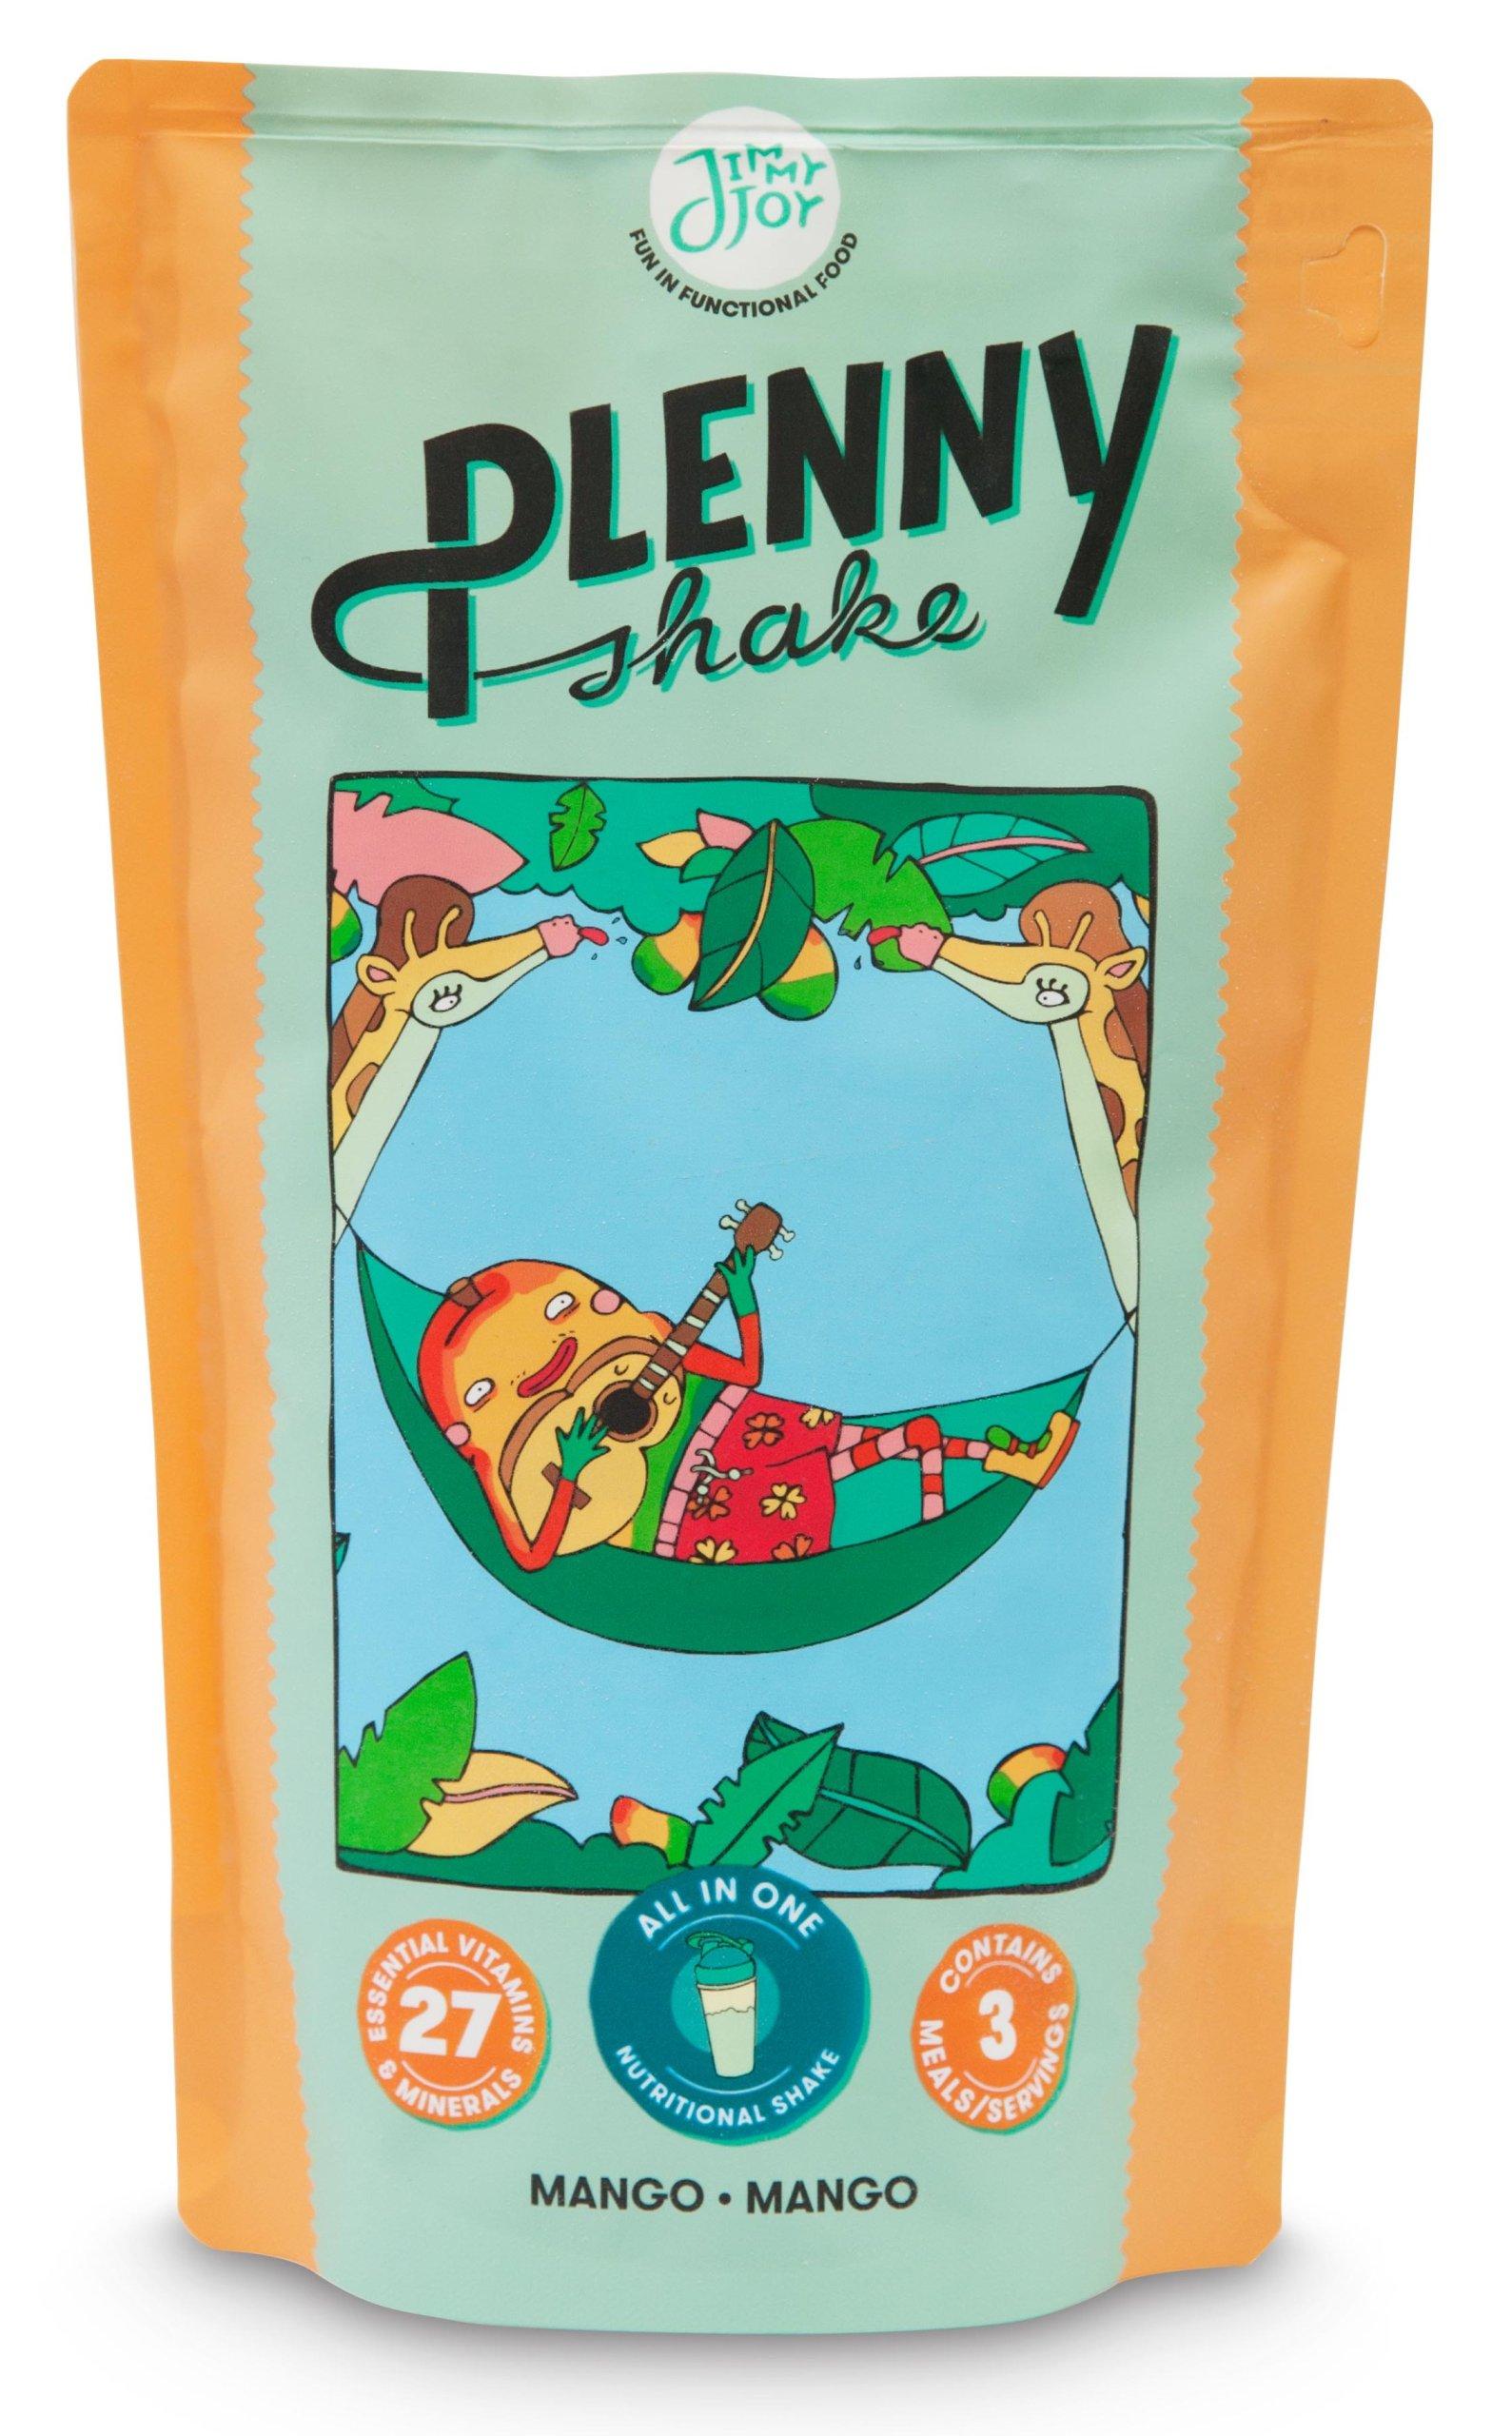 Plenny Shake - mango - szejk.it!